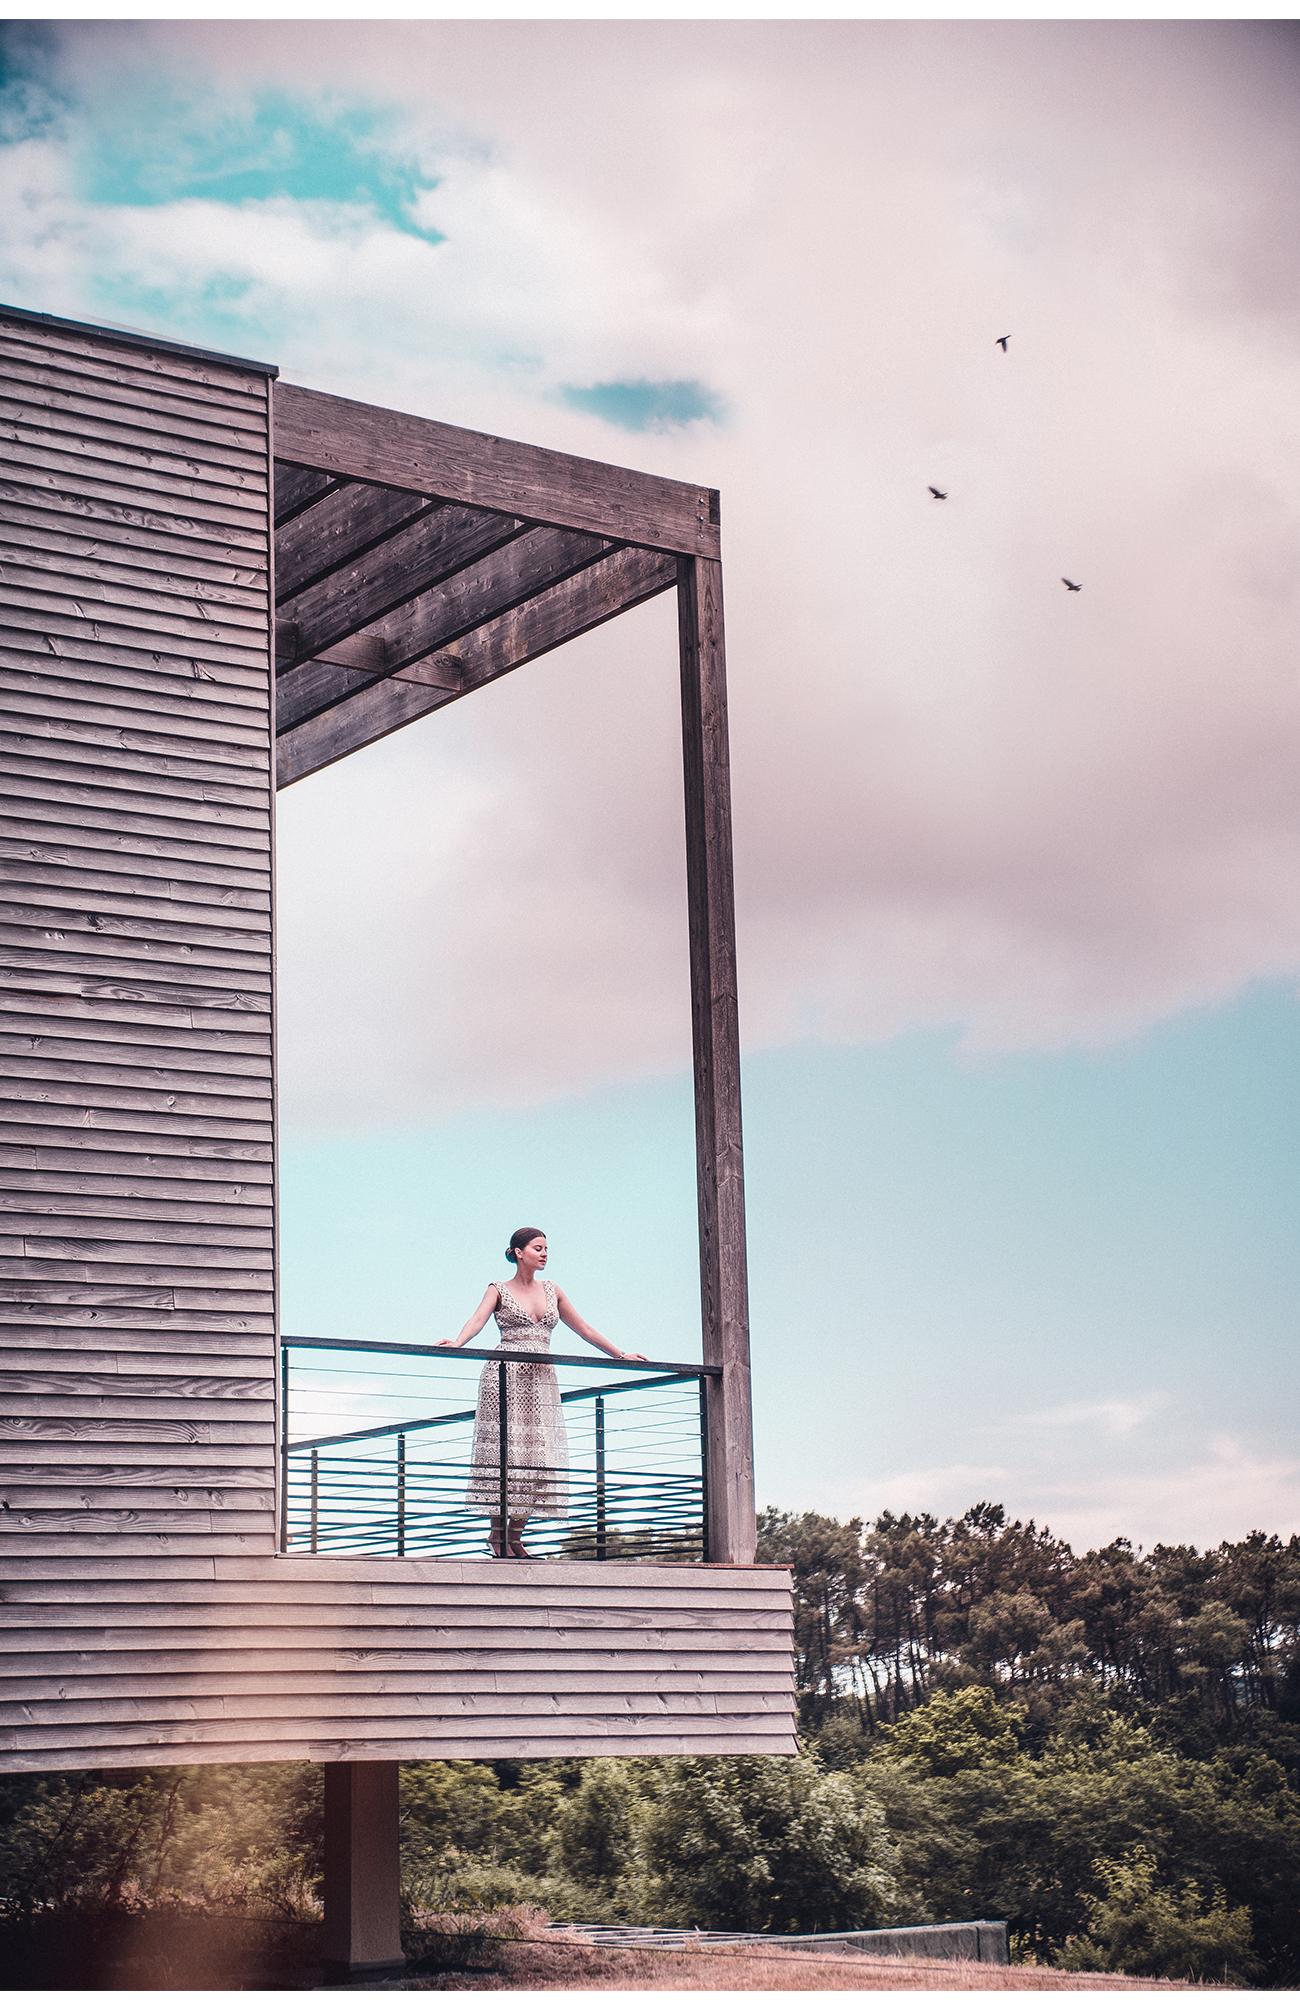 la gree des landes la gacilly yves richer hotel erfahrungen lifestyle blog münchen